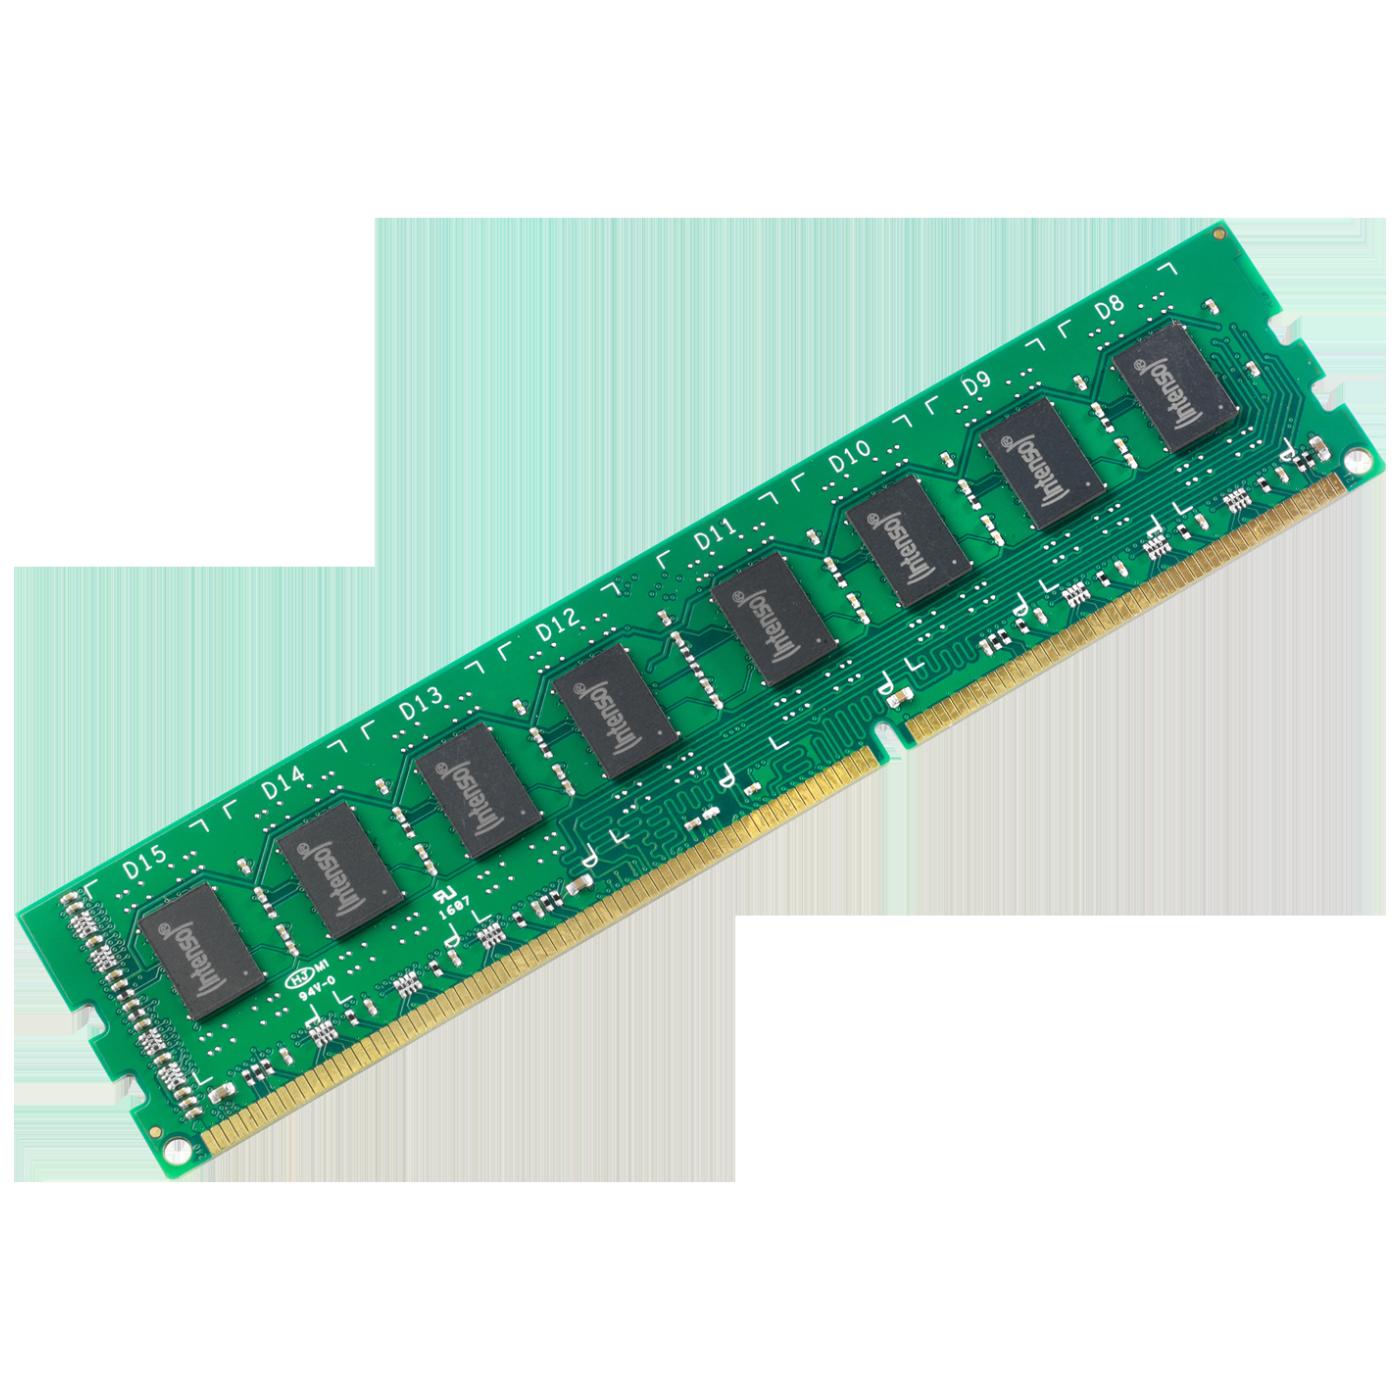 Memorija DDR4 8GB@2400MHz, CL17